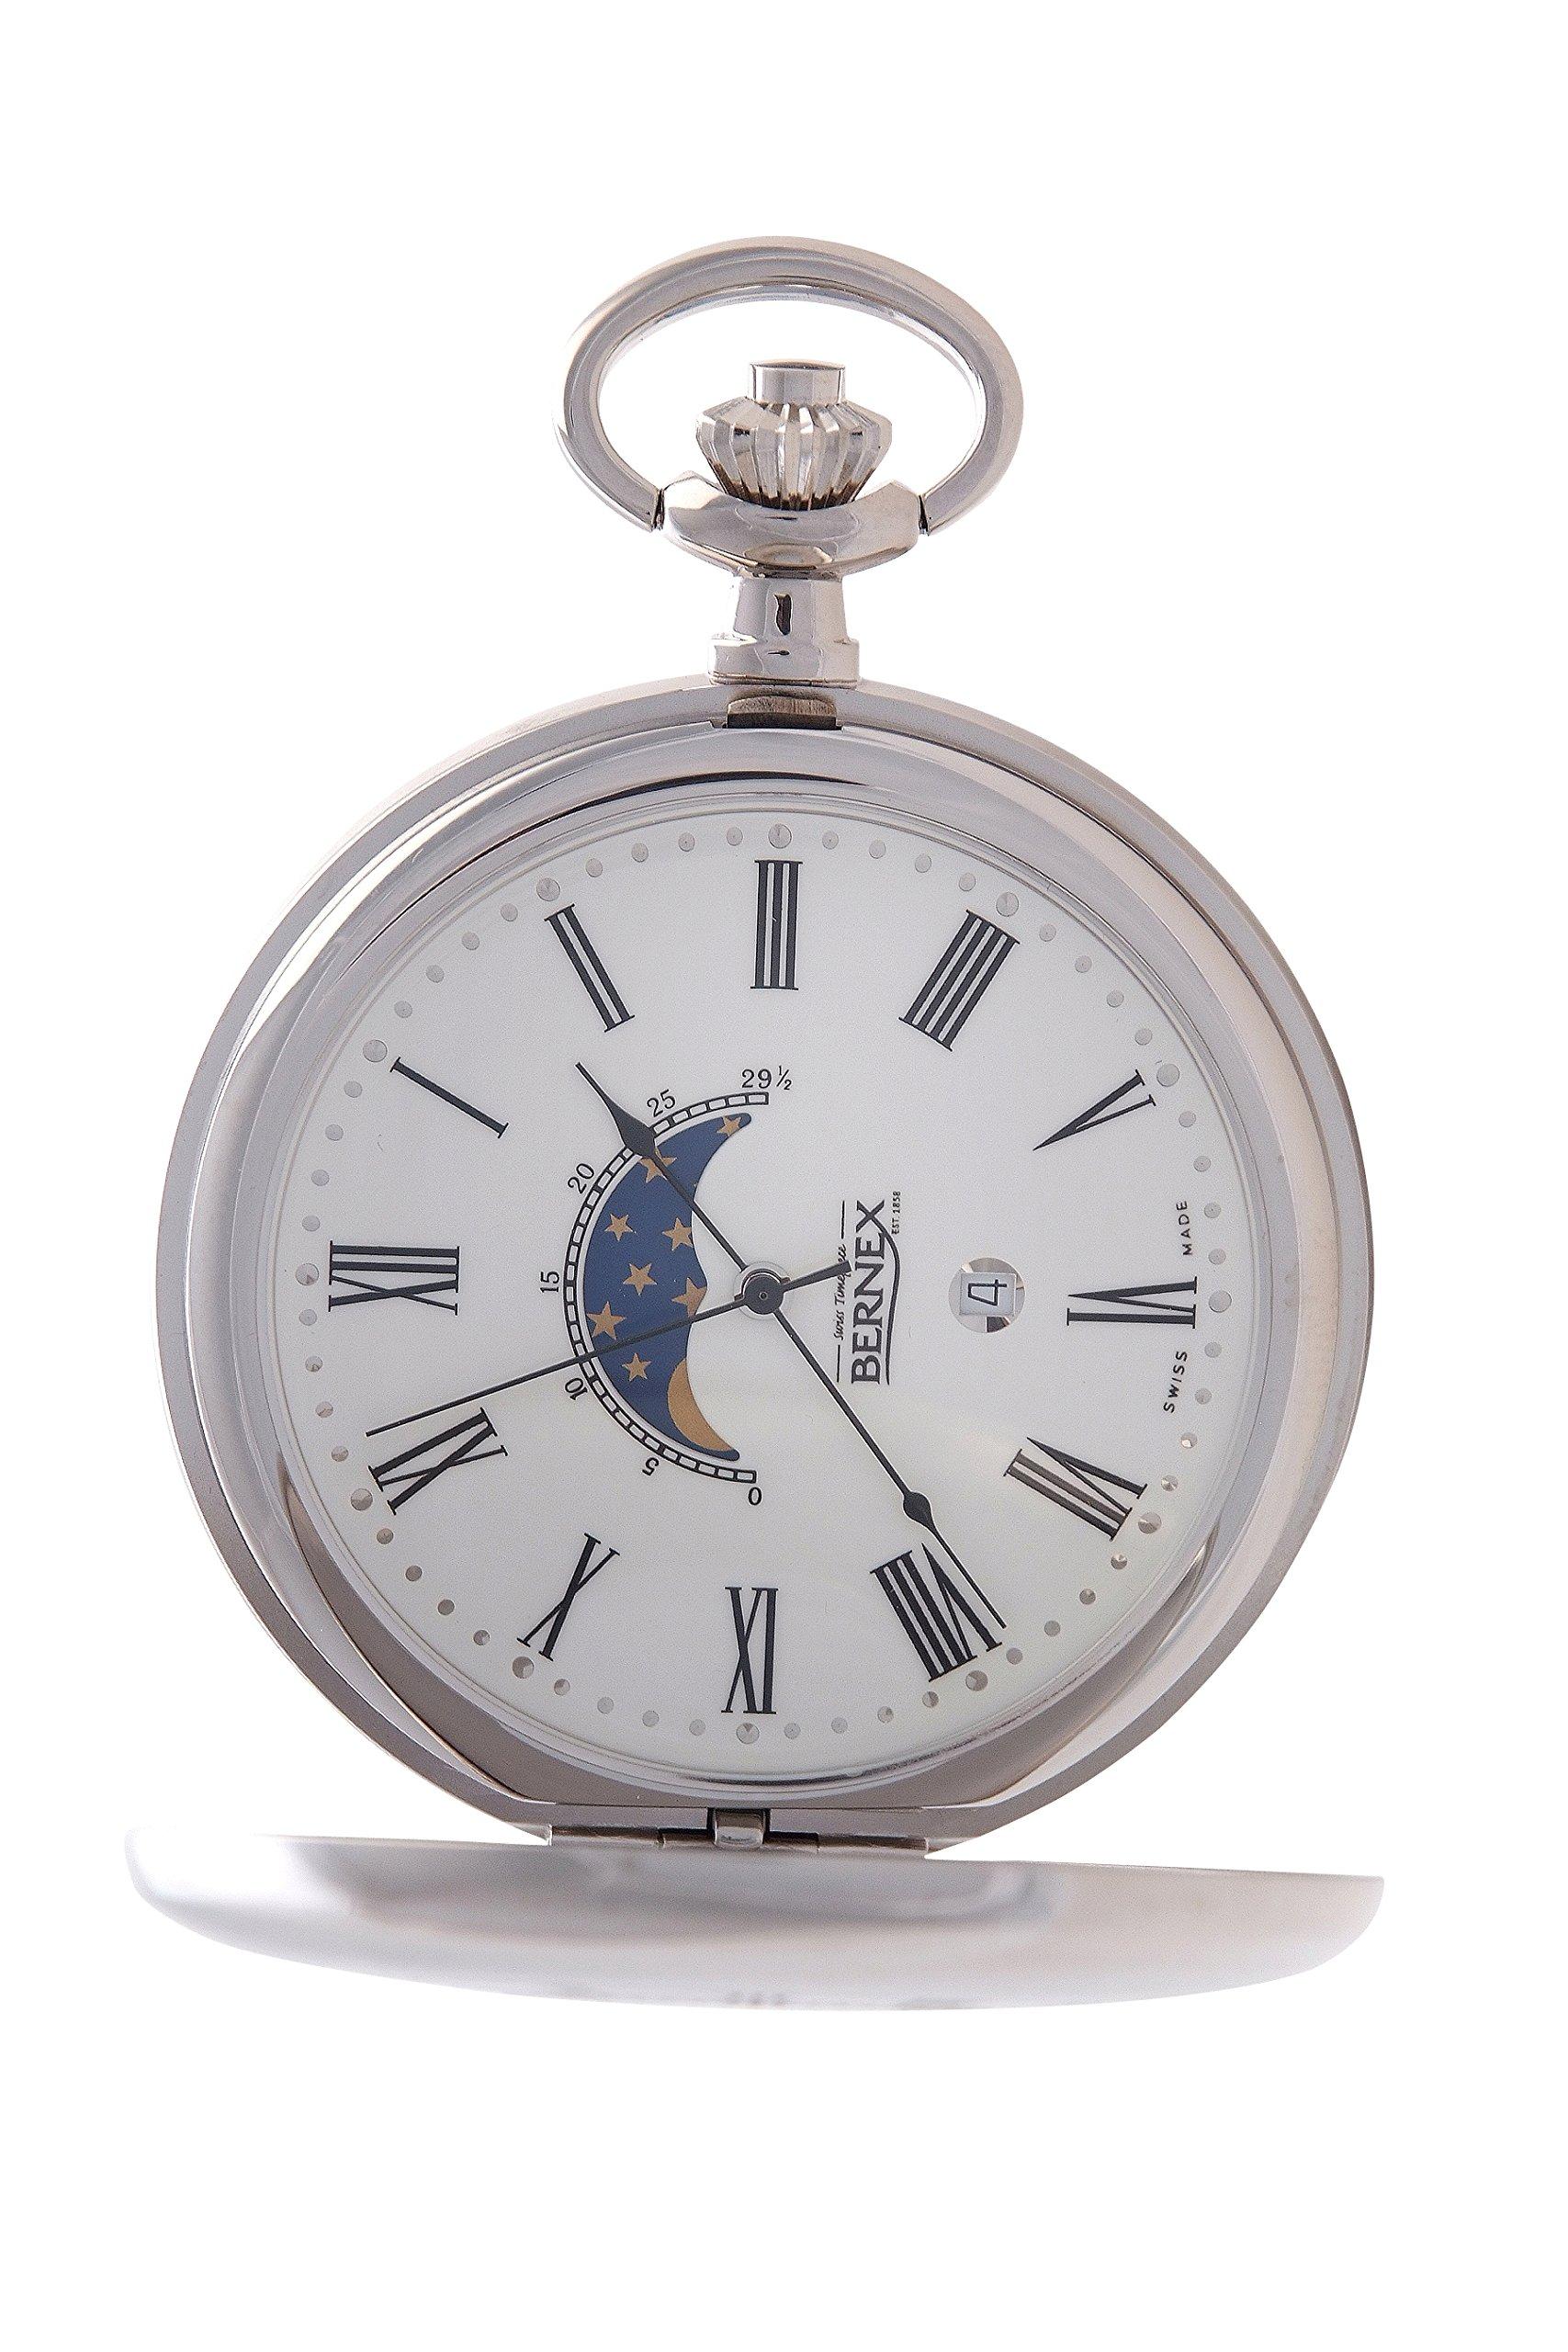 GB21207 - Rhodium Plated - Demi/Half Hunter - Quartz Movement - Roman Dial - White Dial